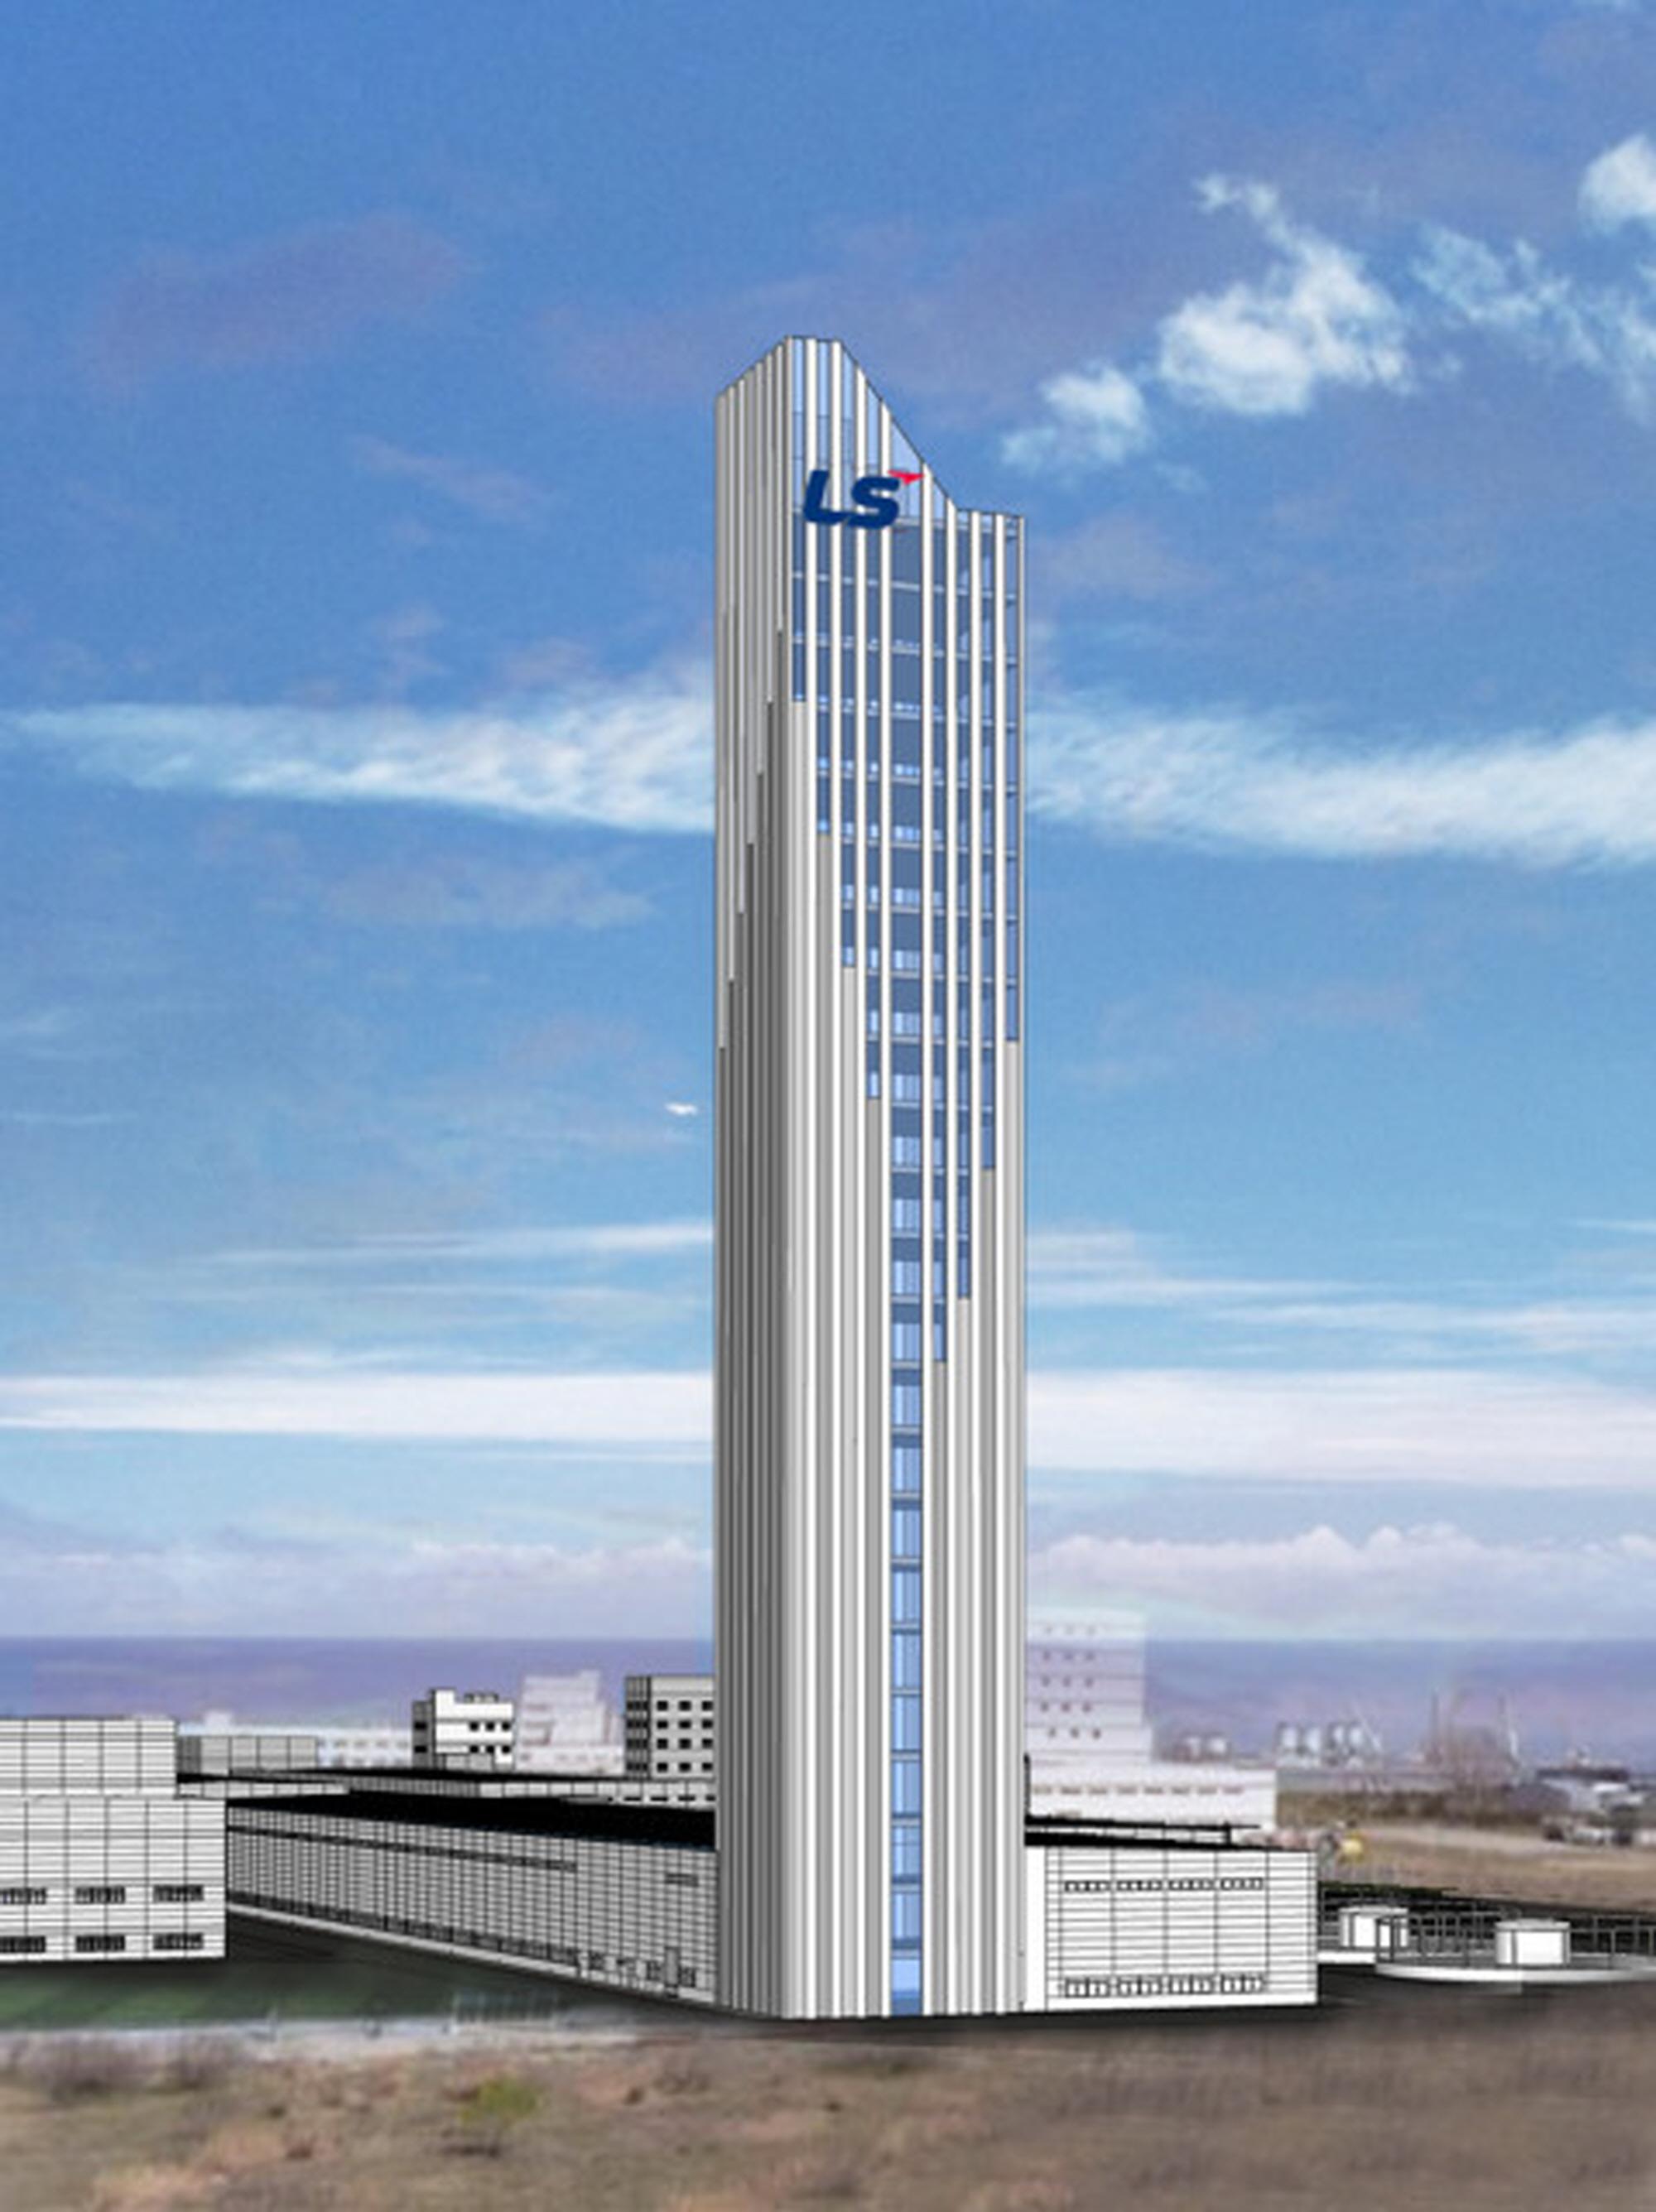 〔ANN의 뉴스 포커스〕 국내 최대 높이 172m 초고층 VCV 초고압 케이블 생산타워